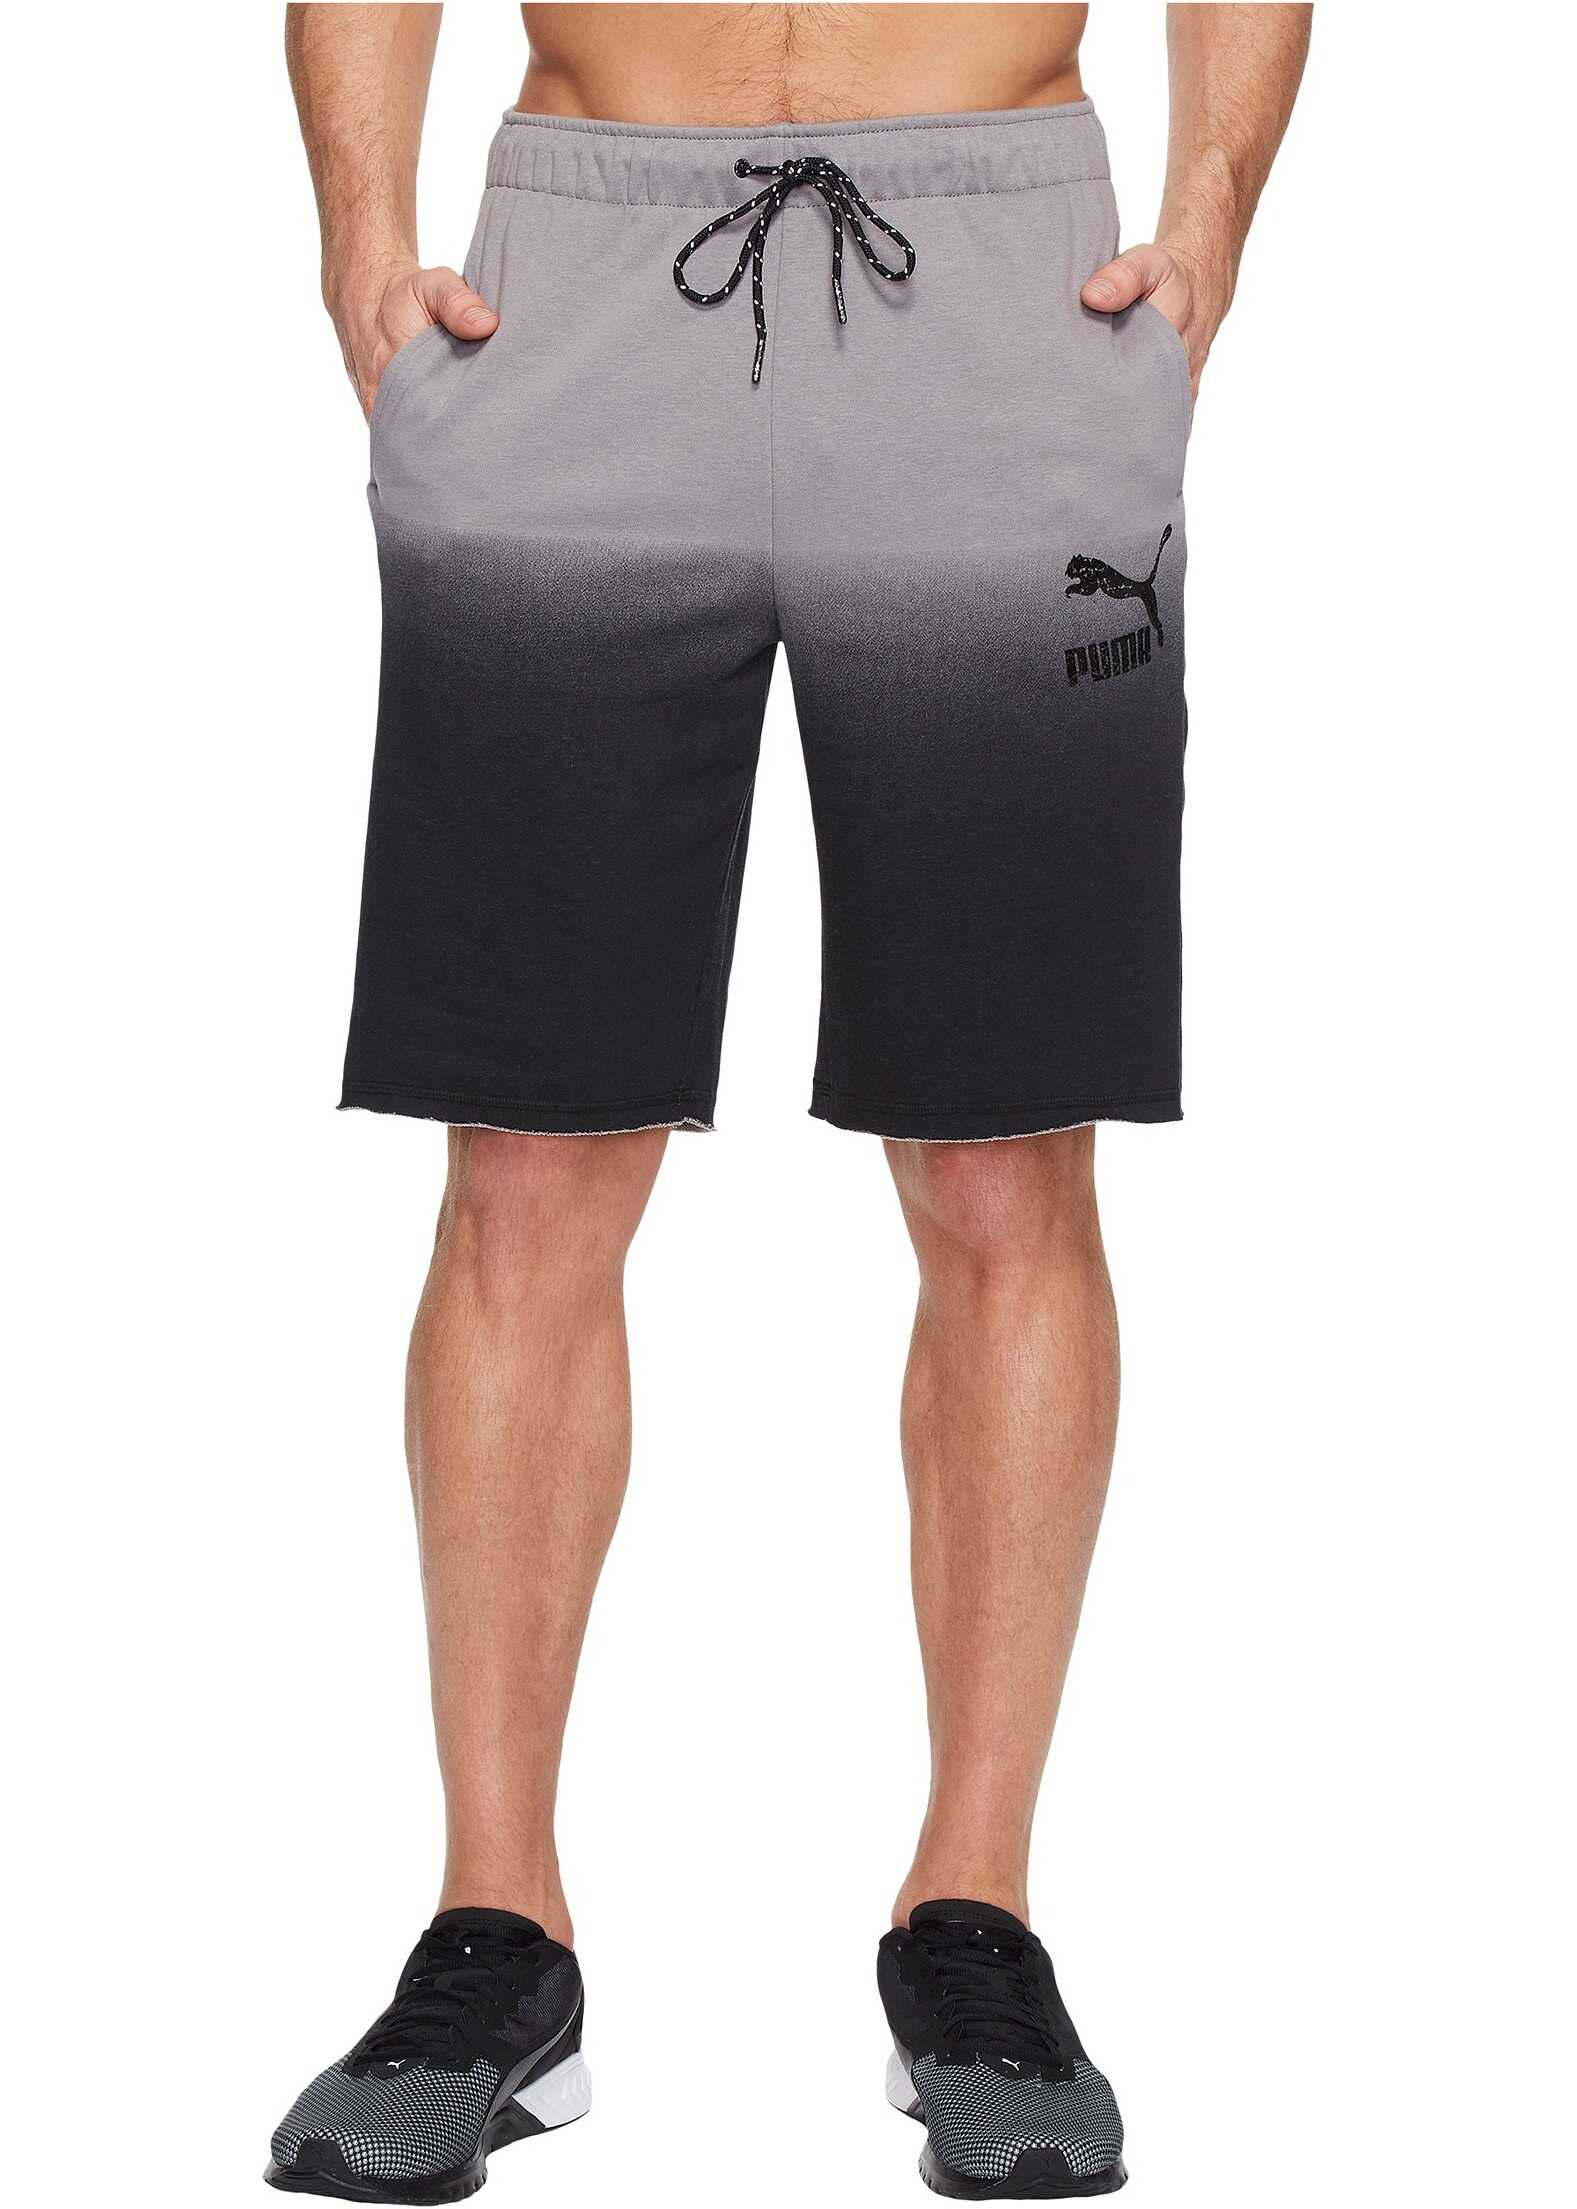 PUMA Flash Shorts Steel Gray/Puma Black